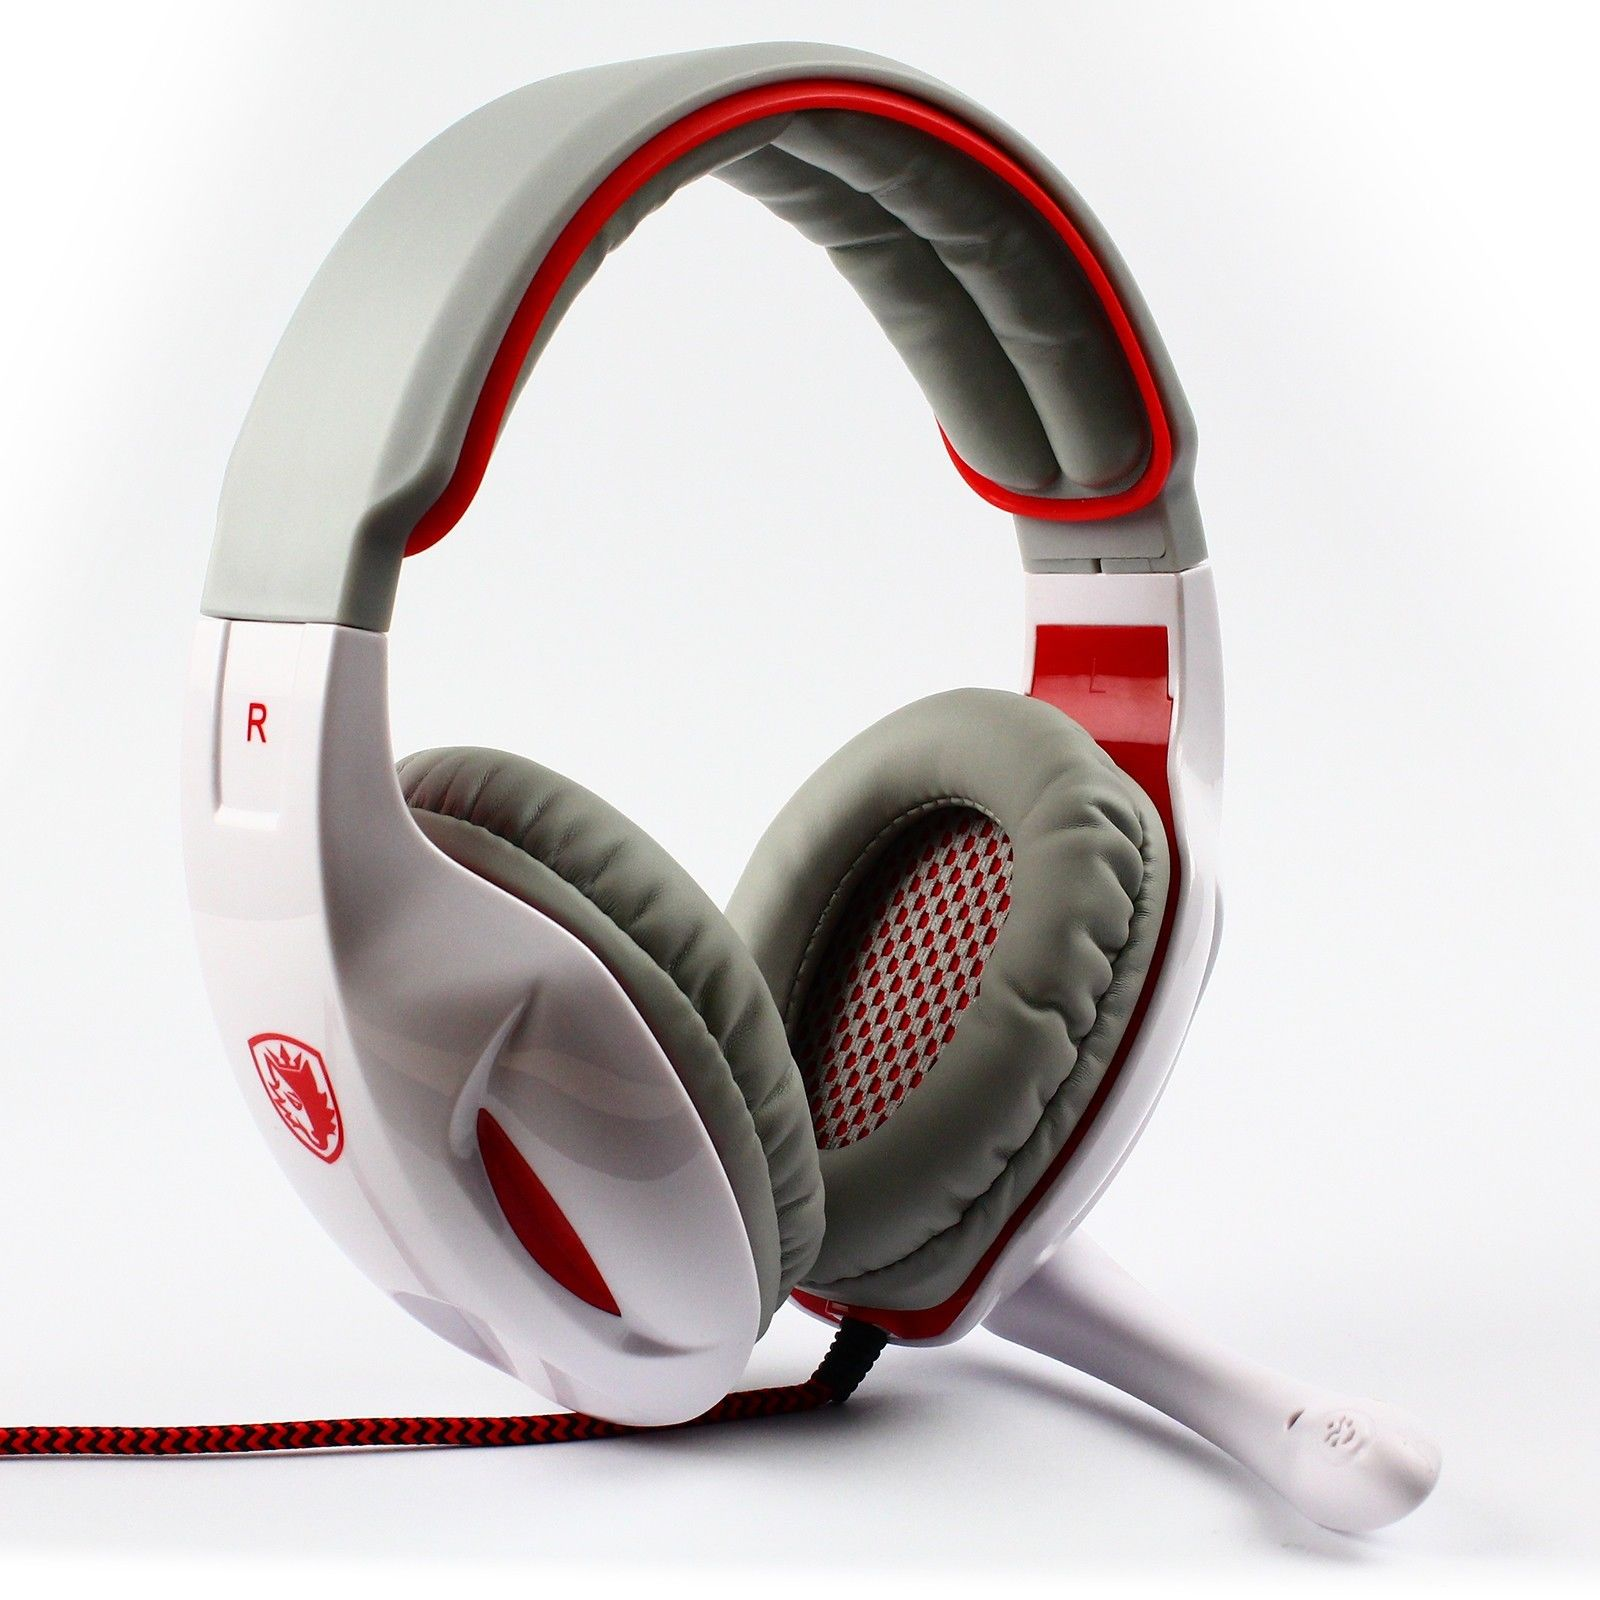 Stereo SA-902 HiFi 7.1 Surround Sound USB Headband Gaming  Headset Cobra Sades